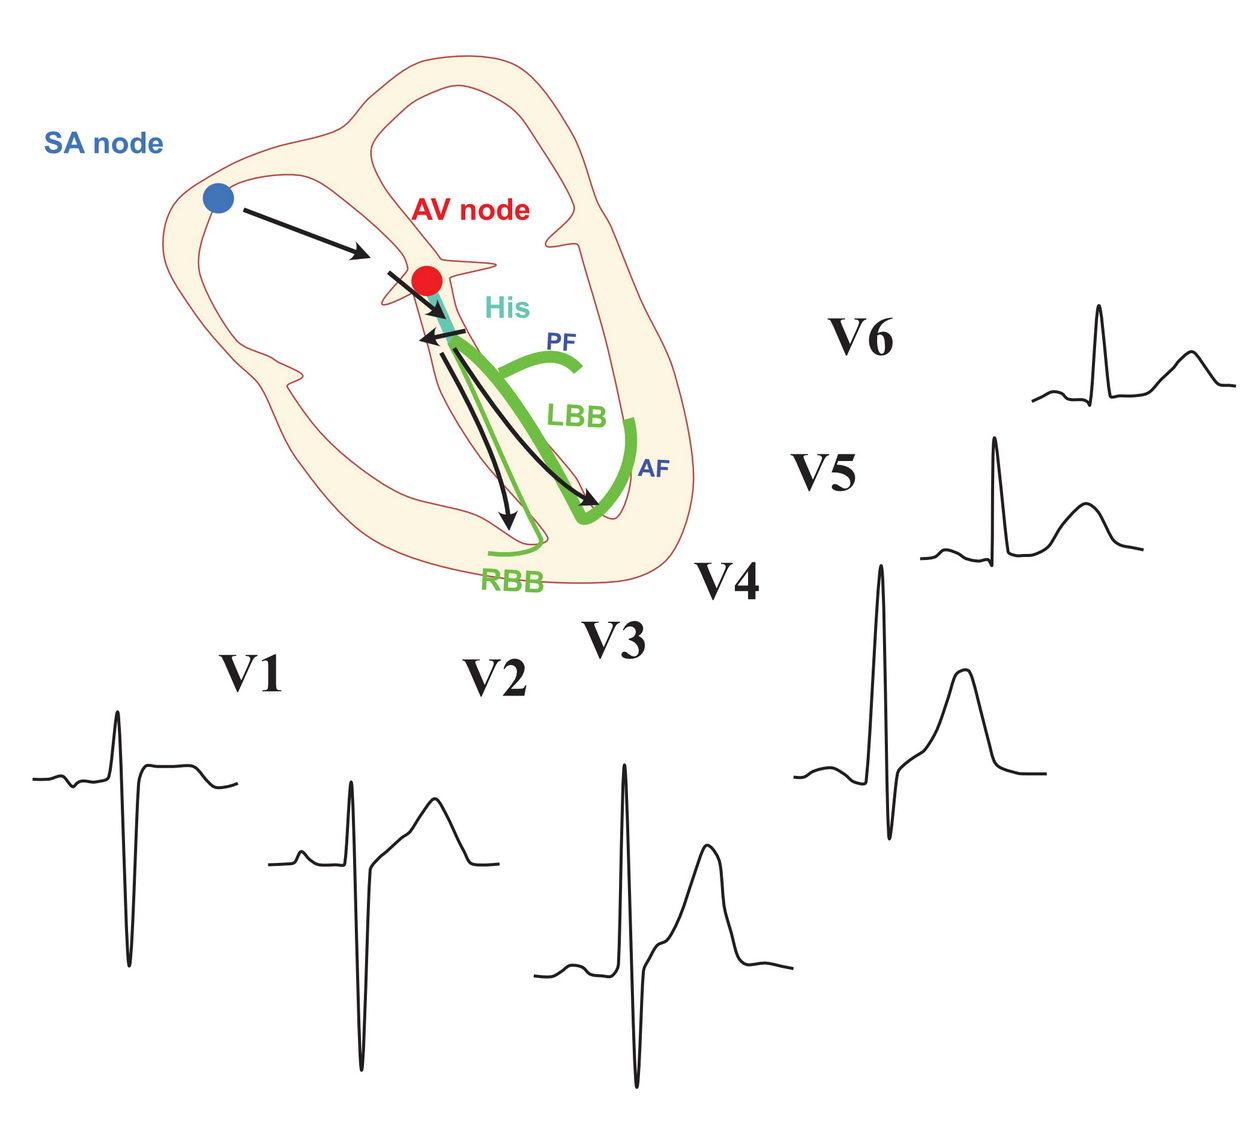 Genesis of the normal ECG - precordial lead activation pattern